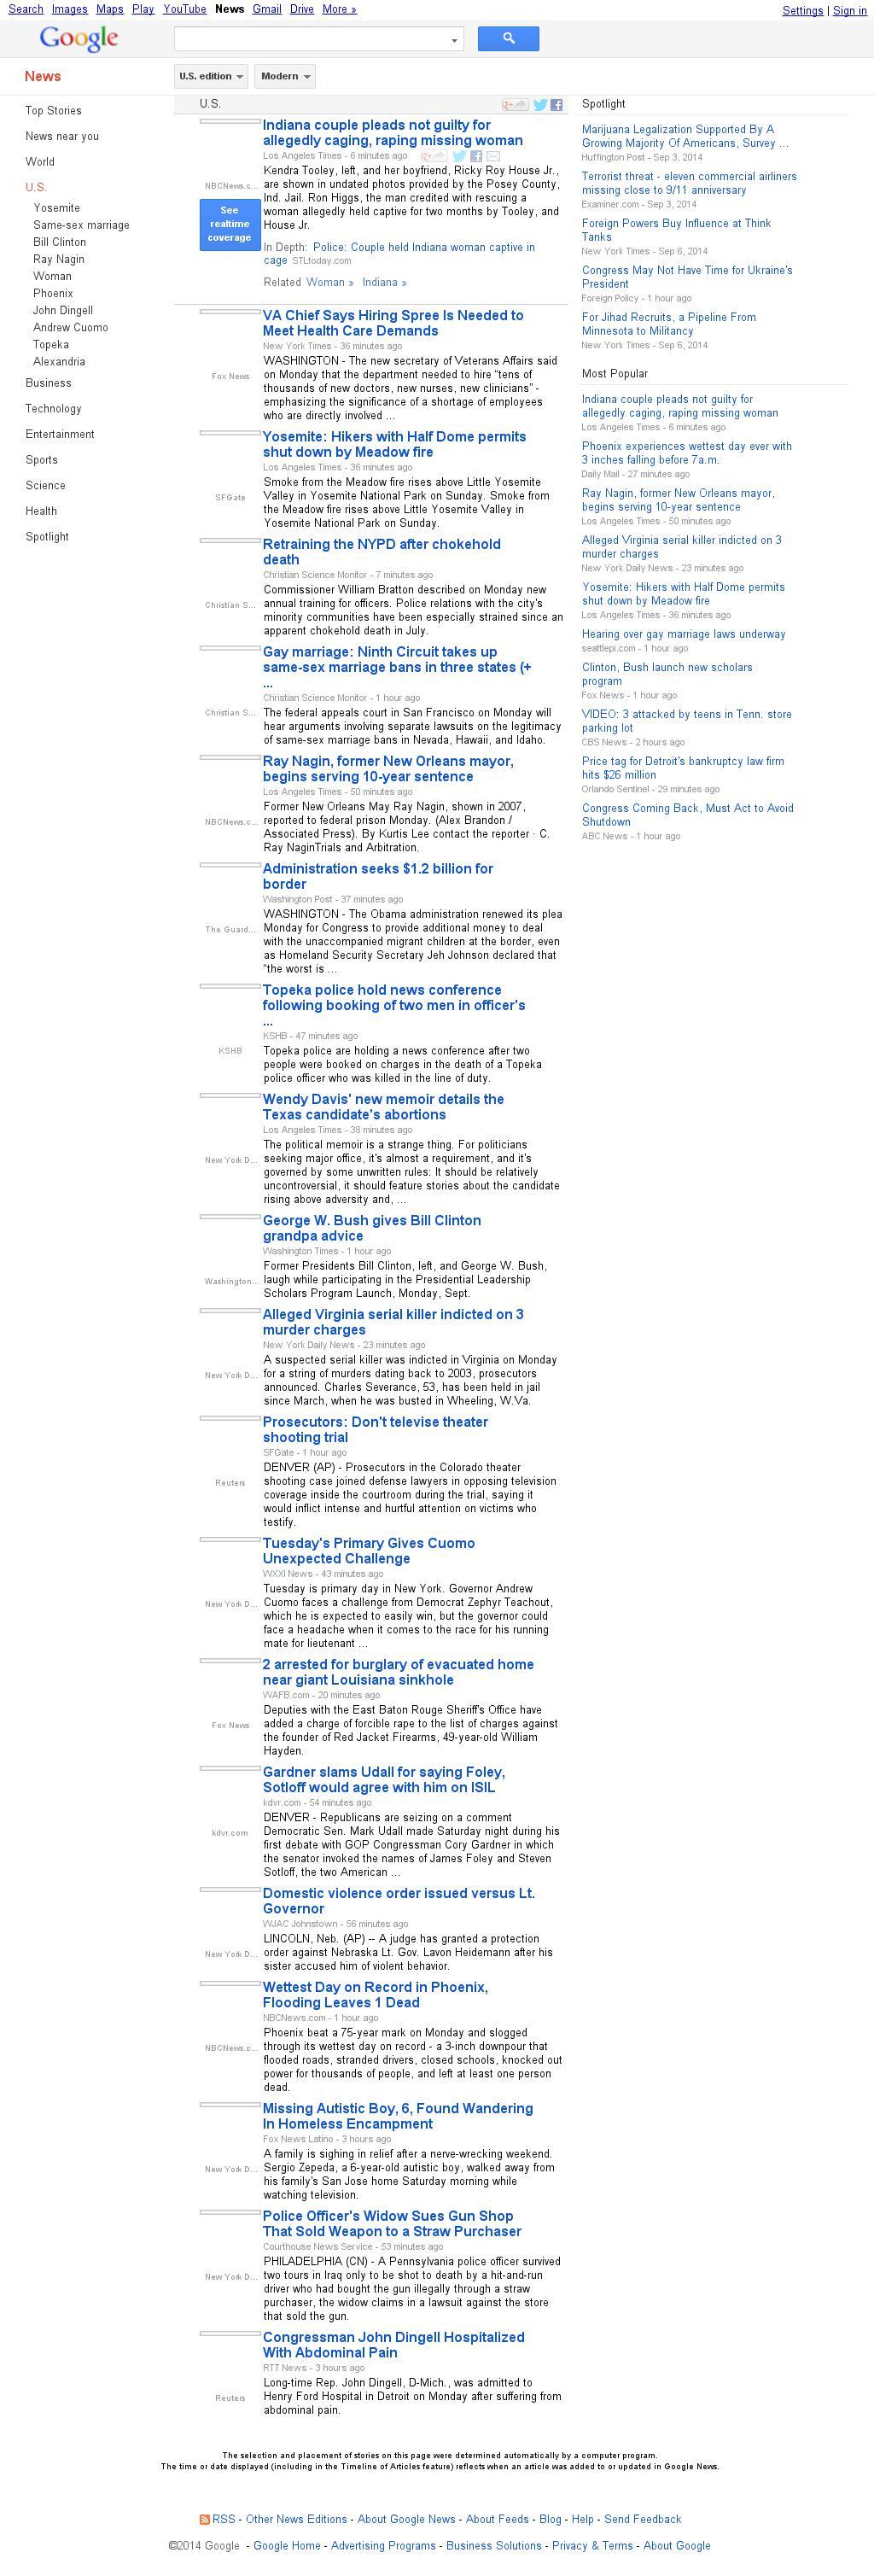 Google News: U.S. at Monday Sept. 8, 2014, 10:09 p.m. UTC